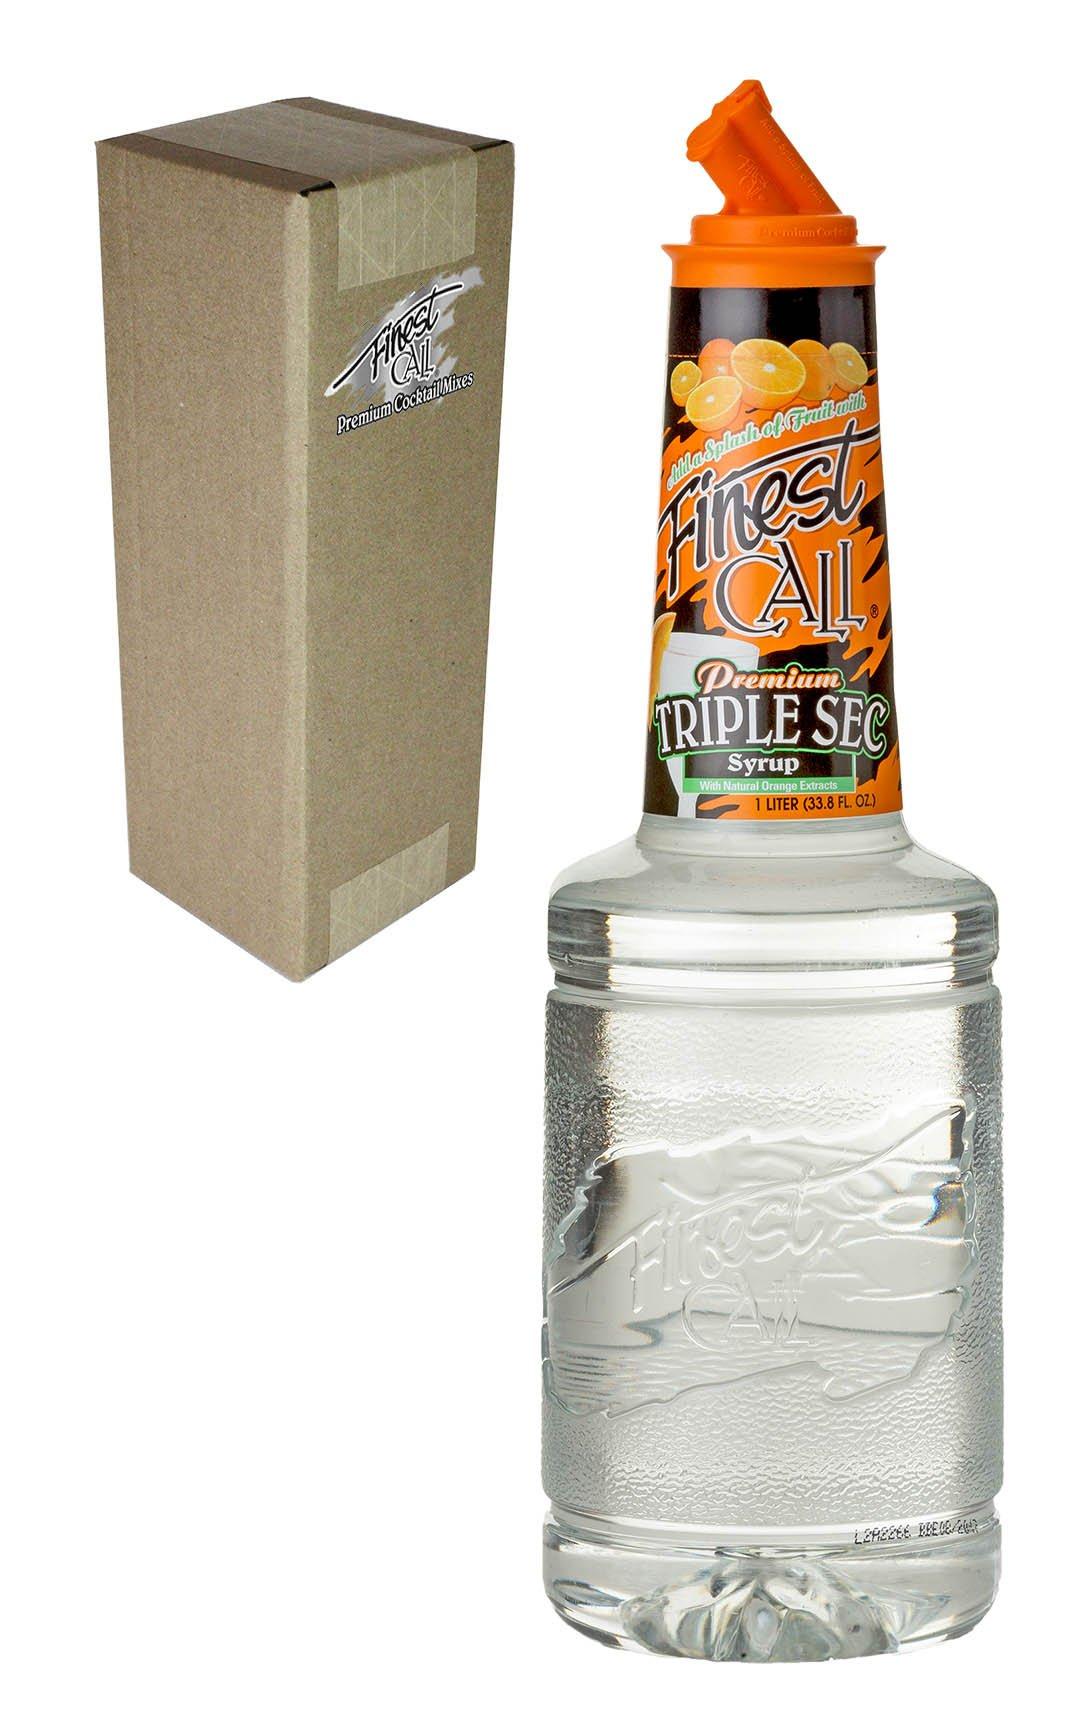 Finest Call Premium Blue Curacao Drink Mix Bottle